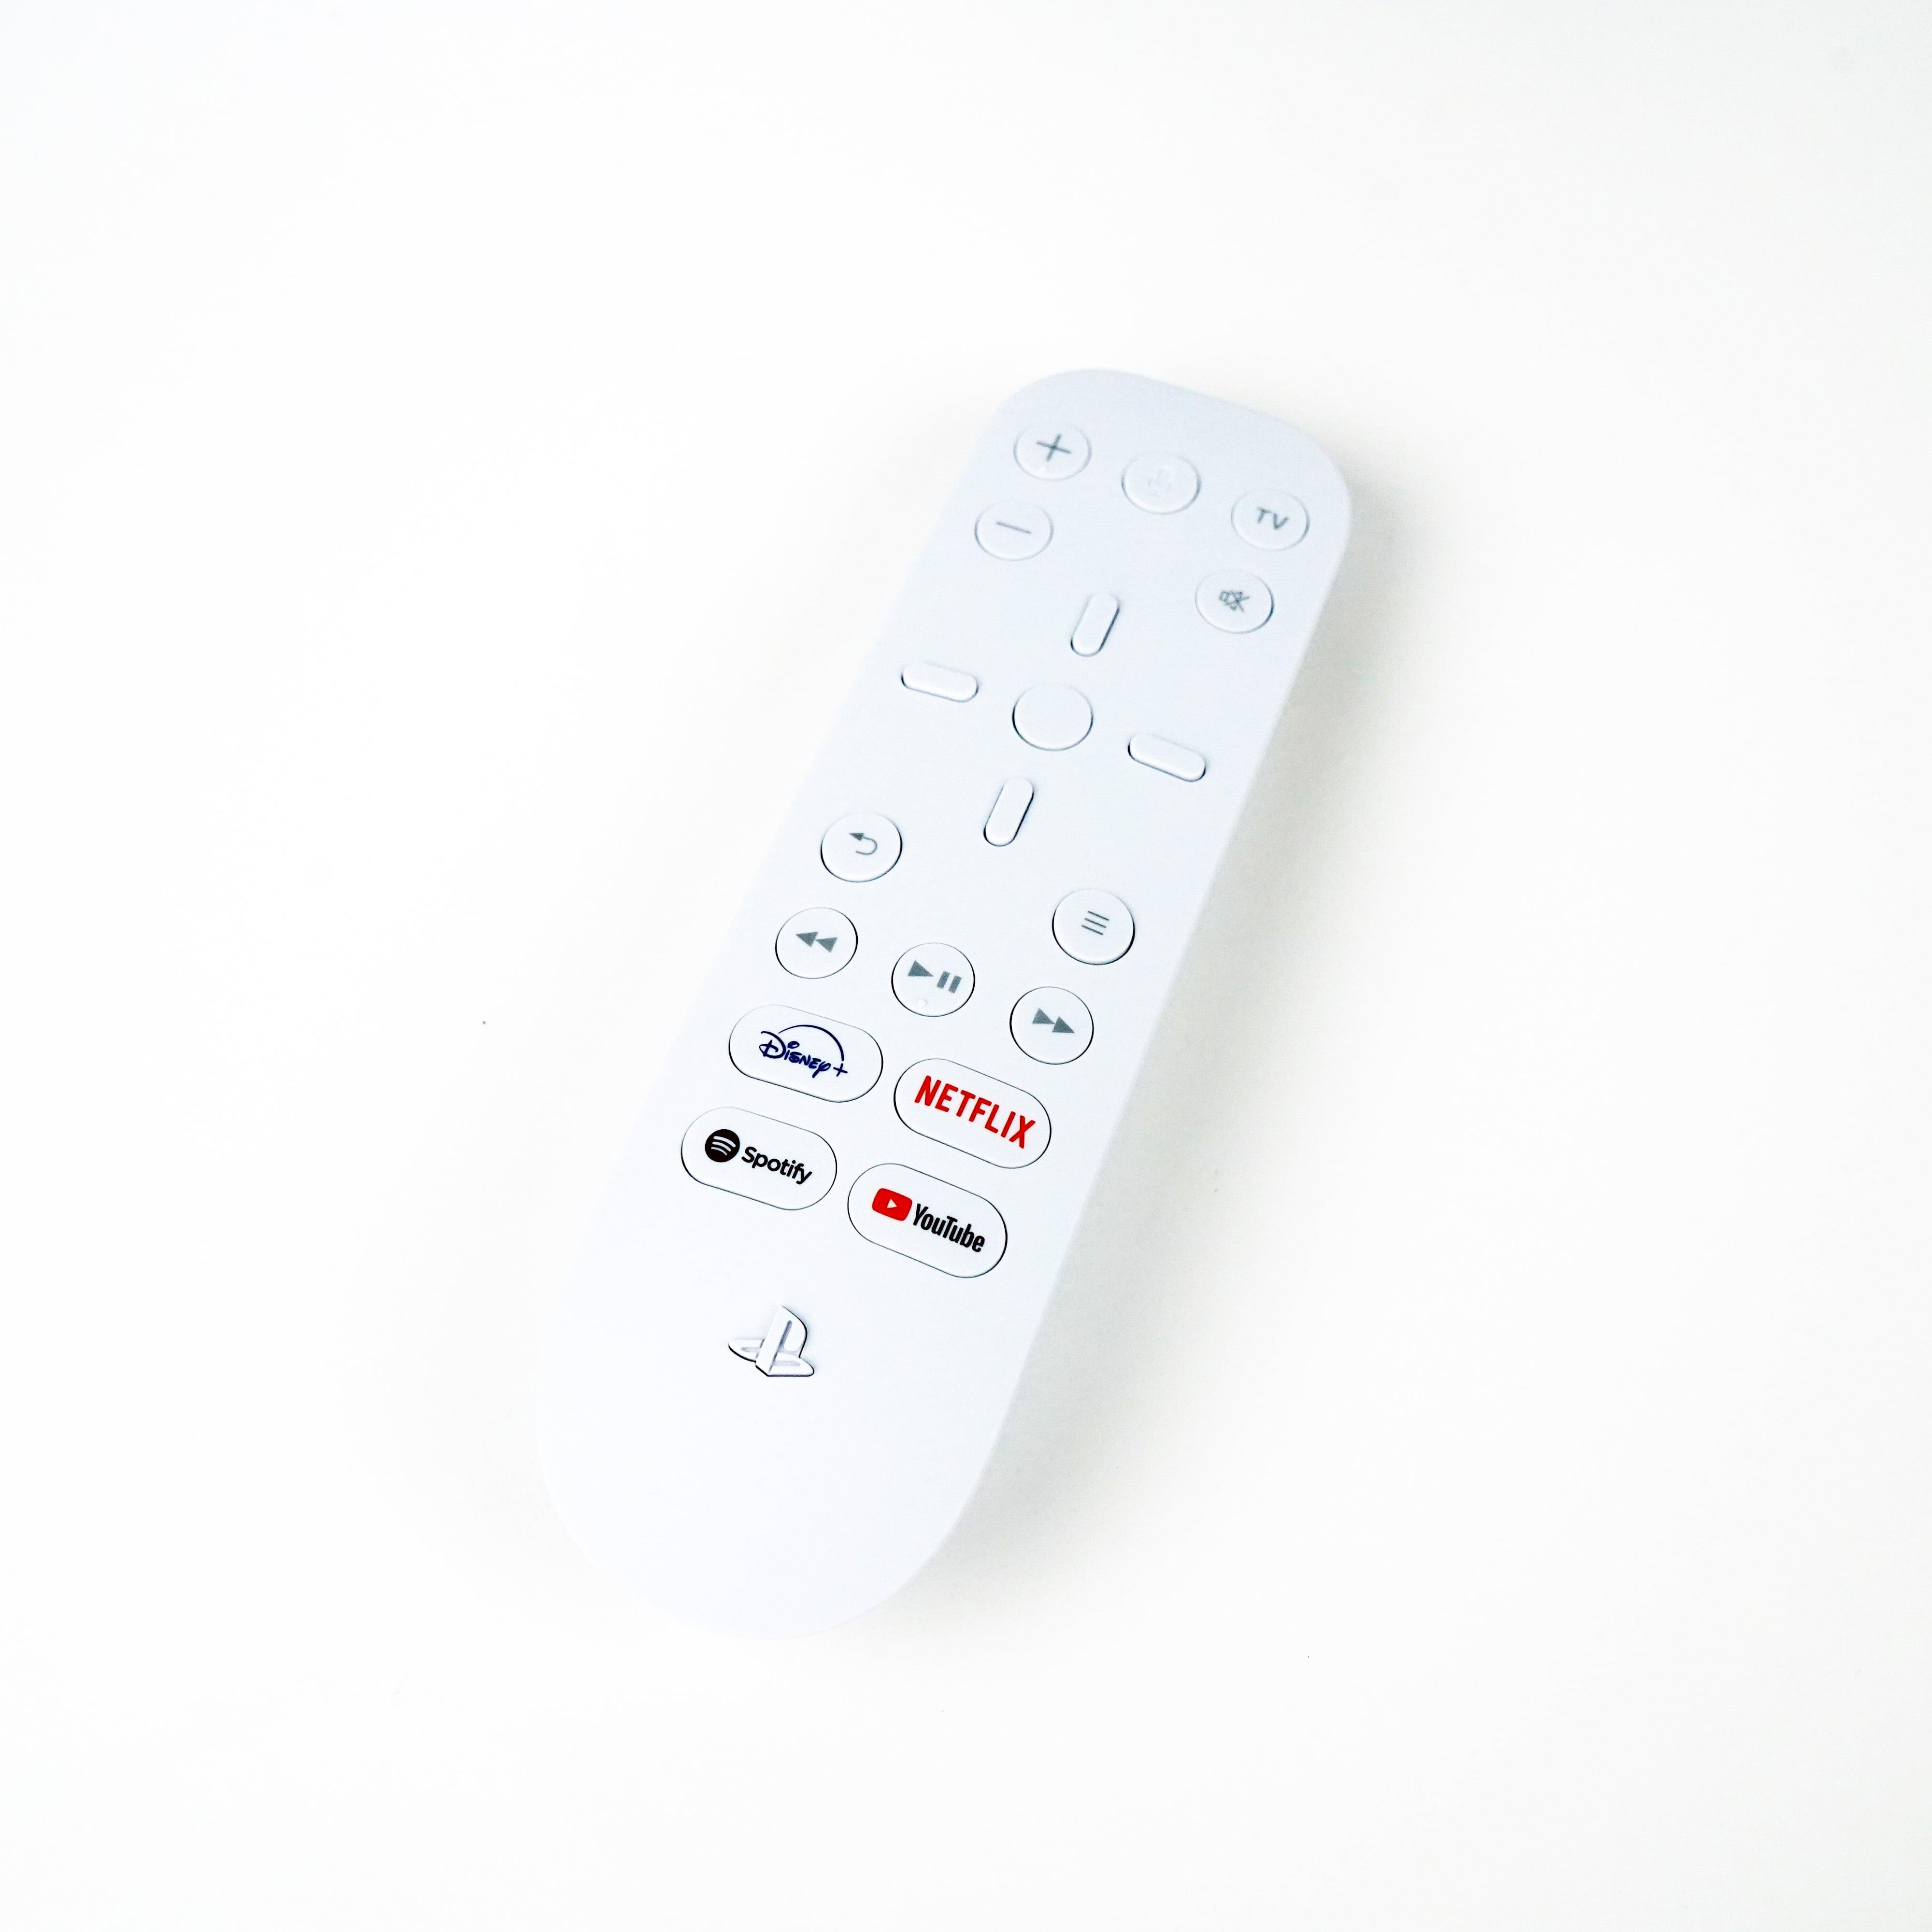 pilot-media-remote2-min.jpg